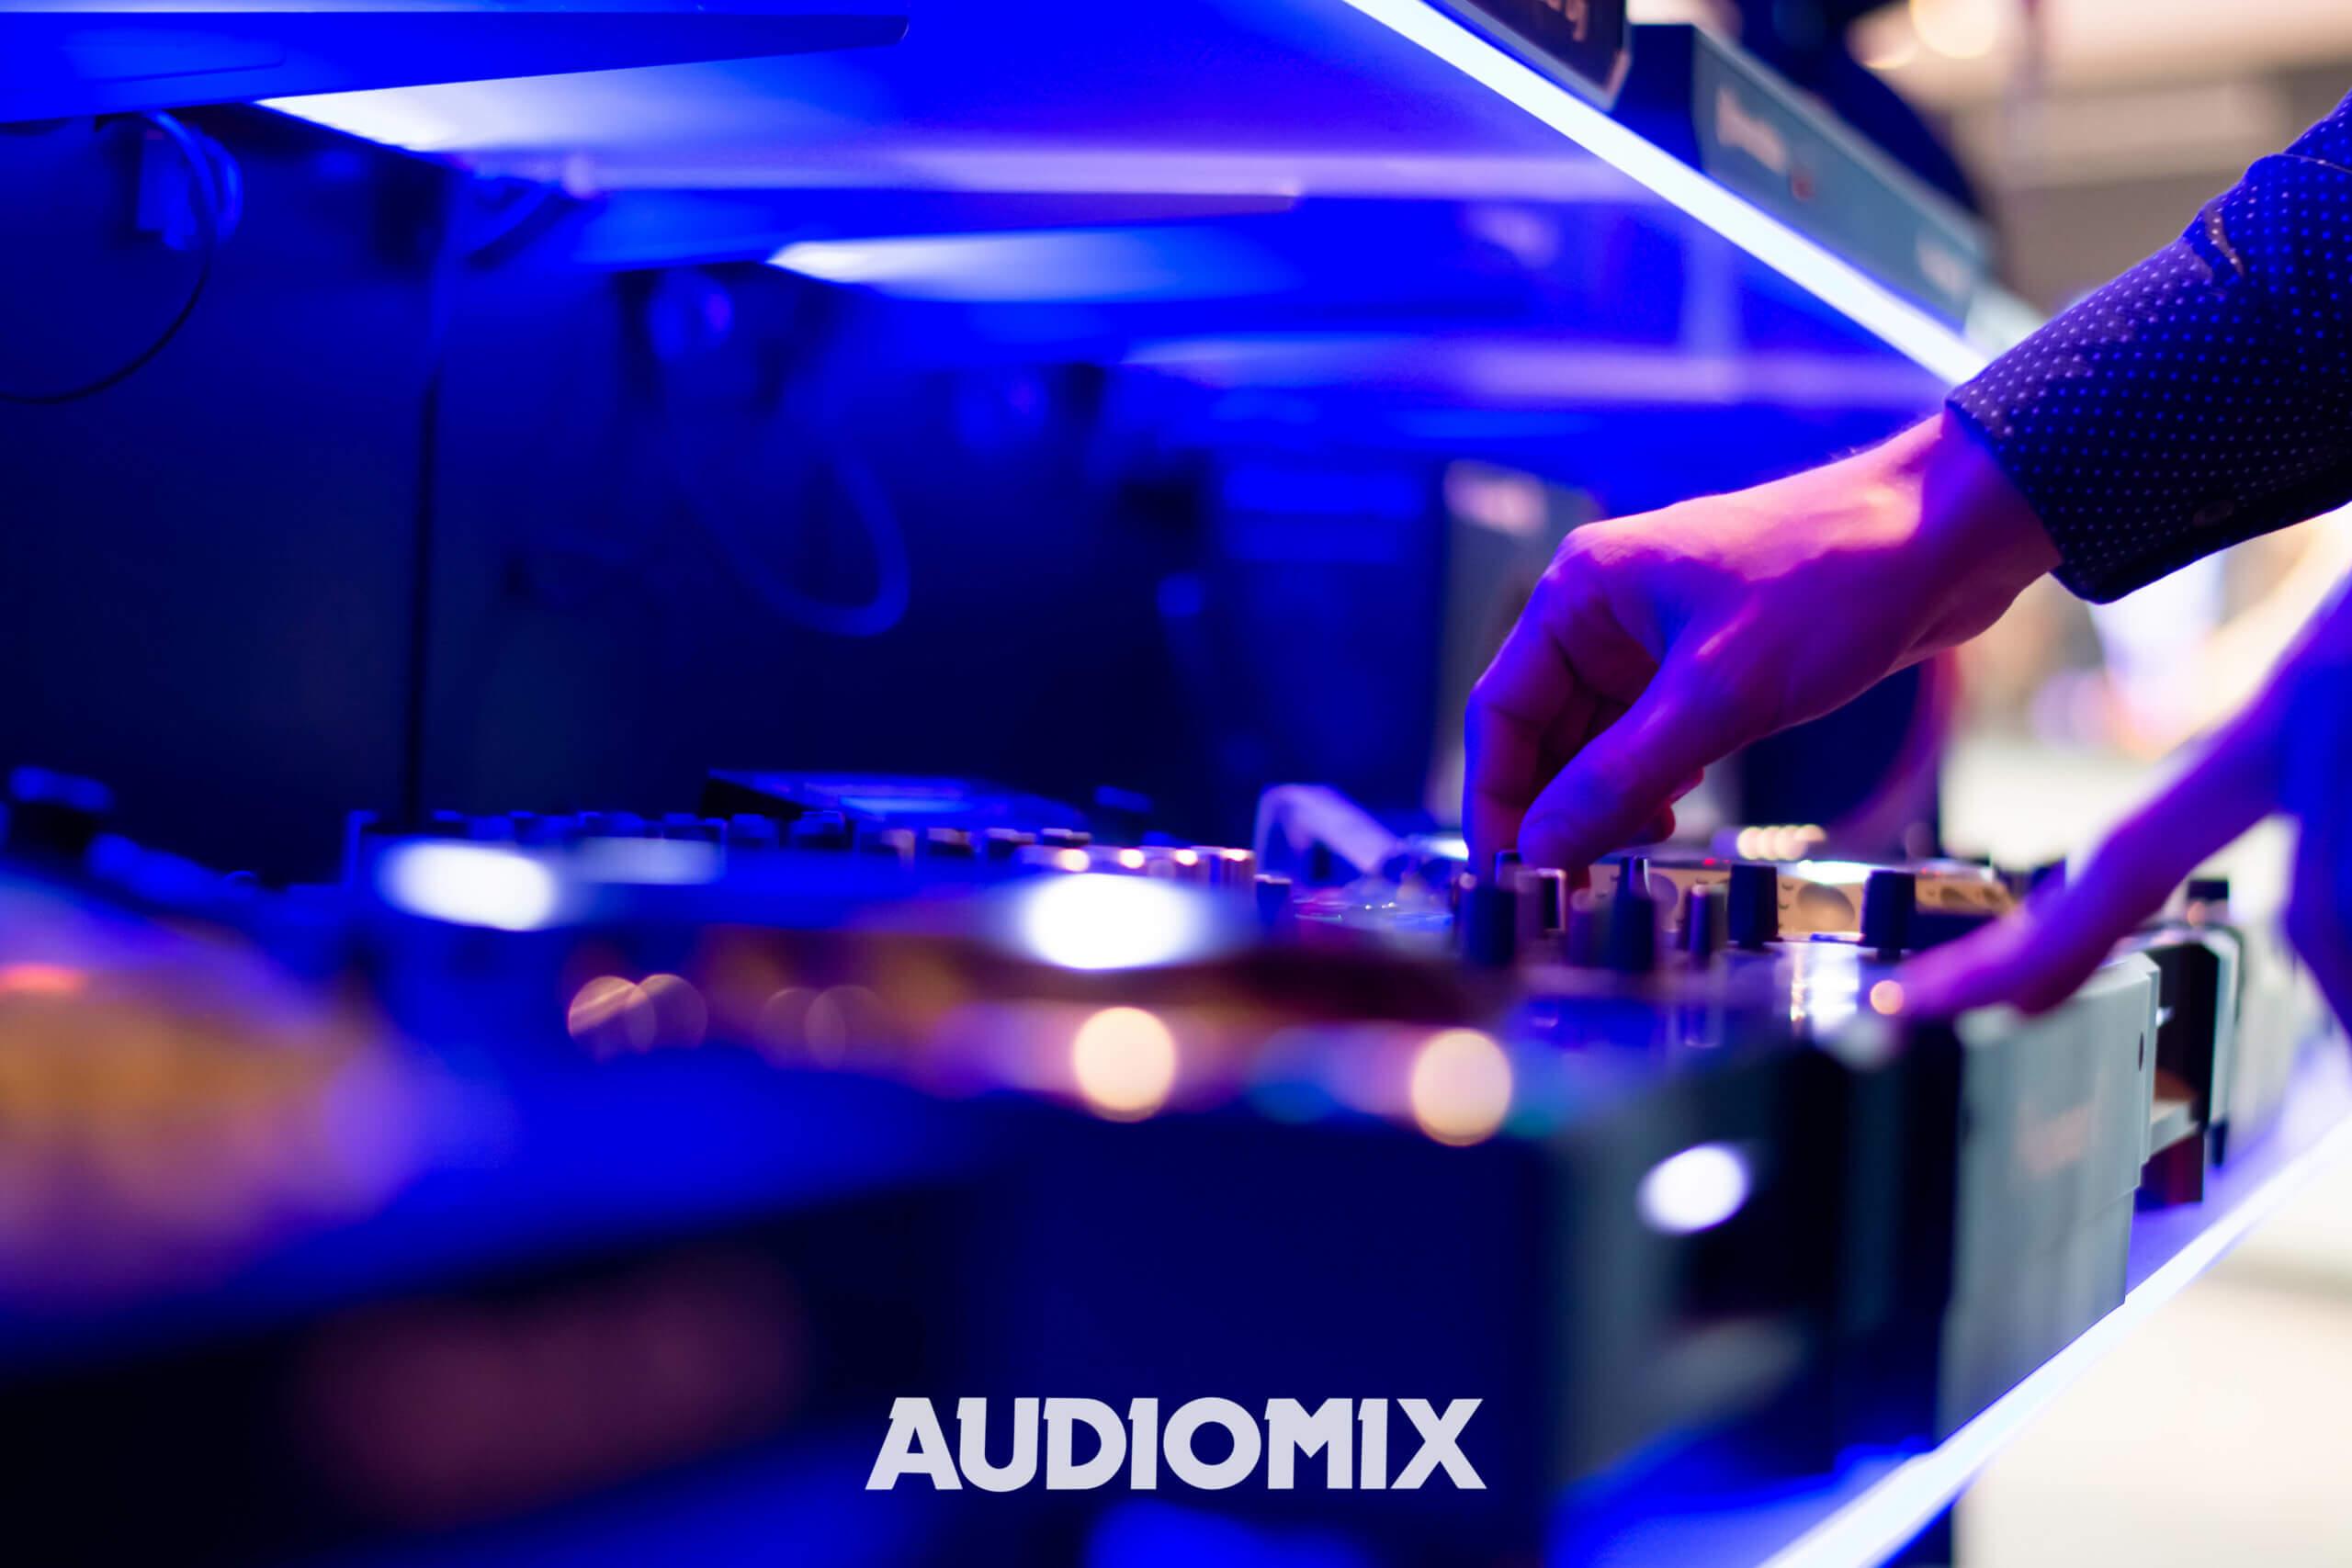 dj audiomix